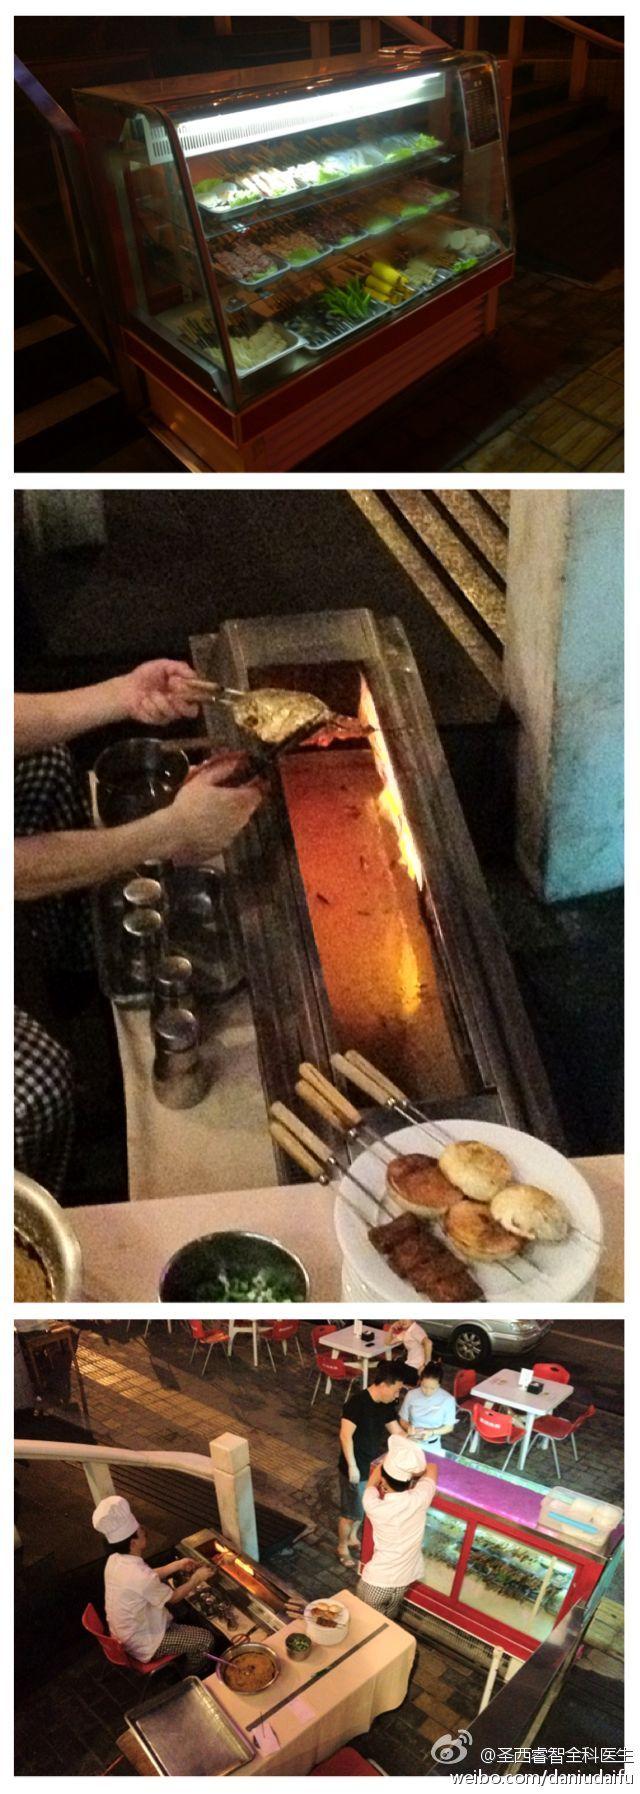 Meizhou Dongpo 眉洲东坡, food safety, BBQ, 串肉